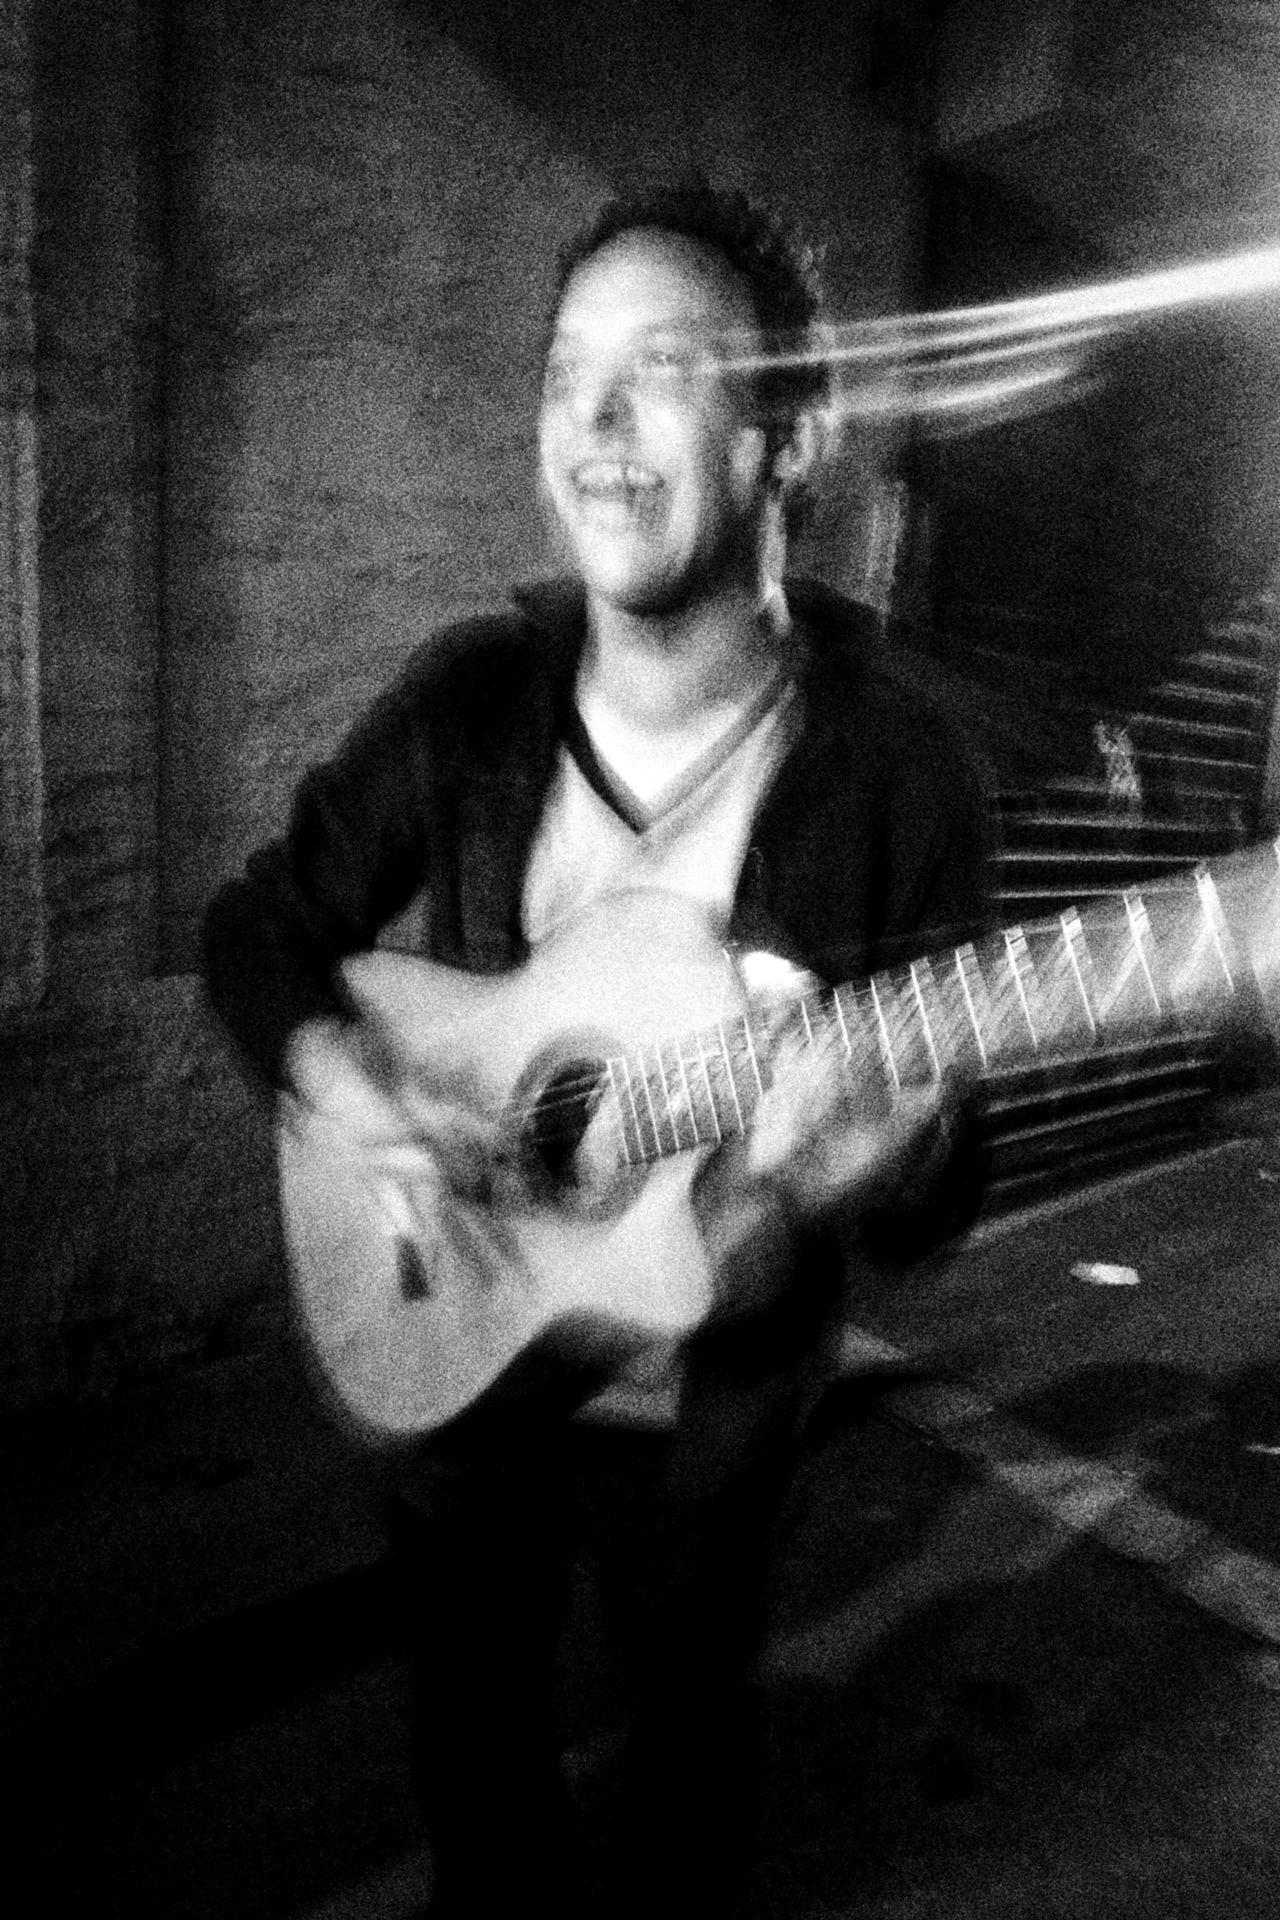 Le Guitariste...